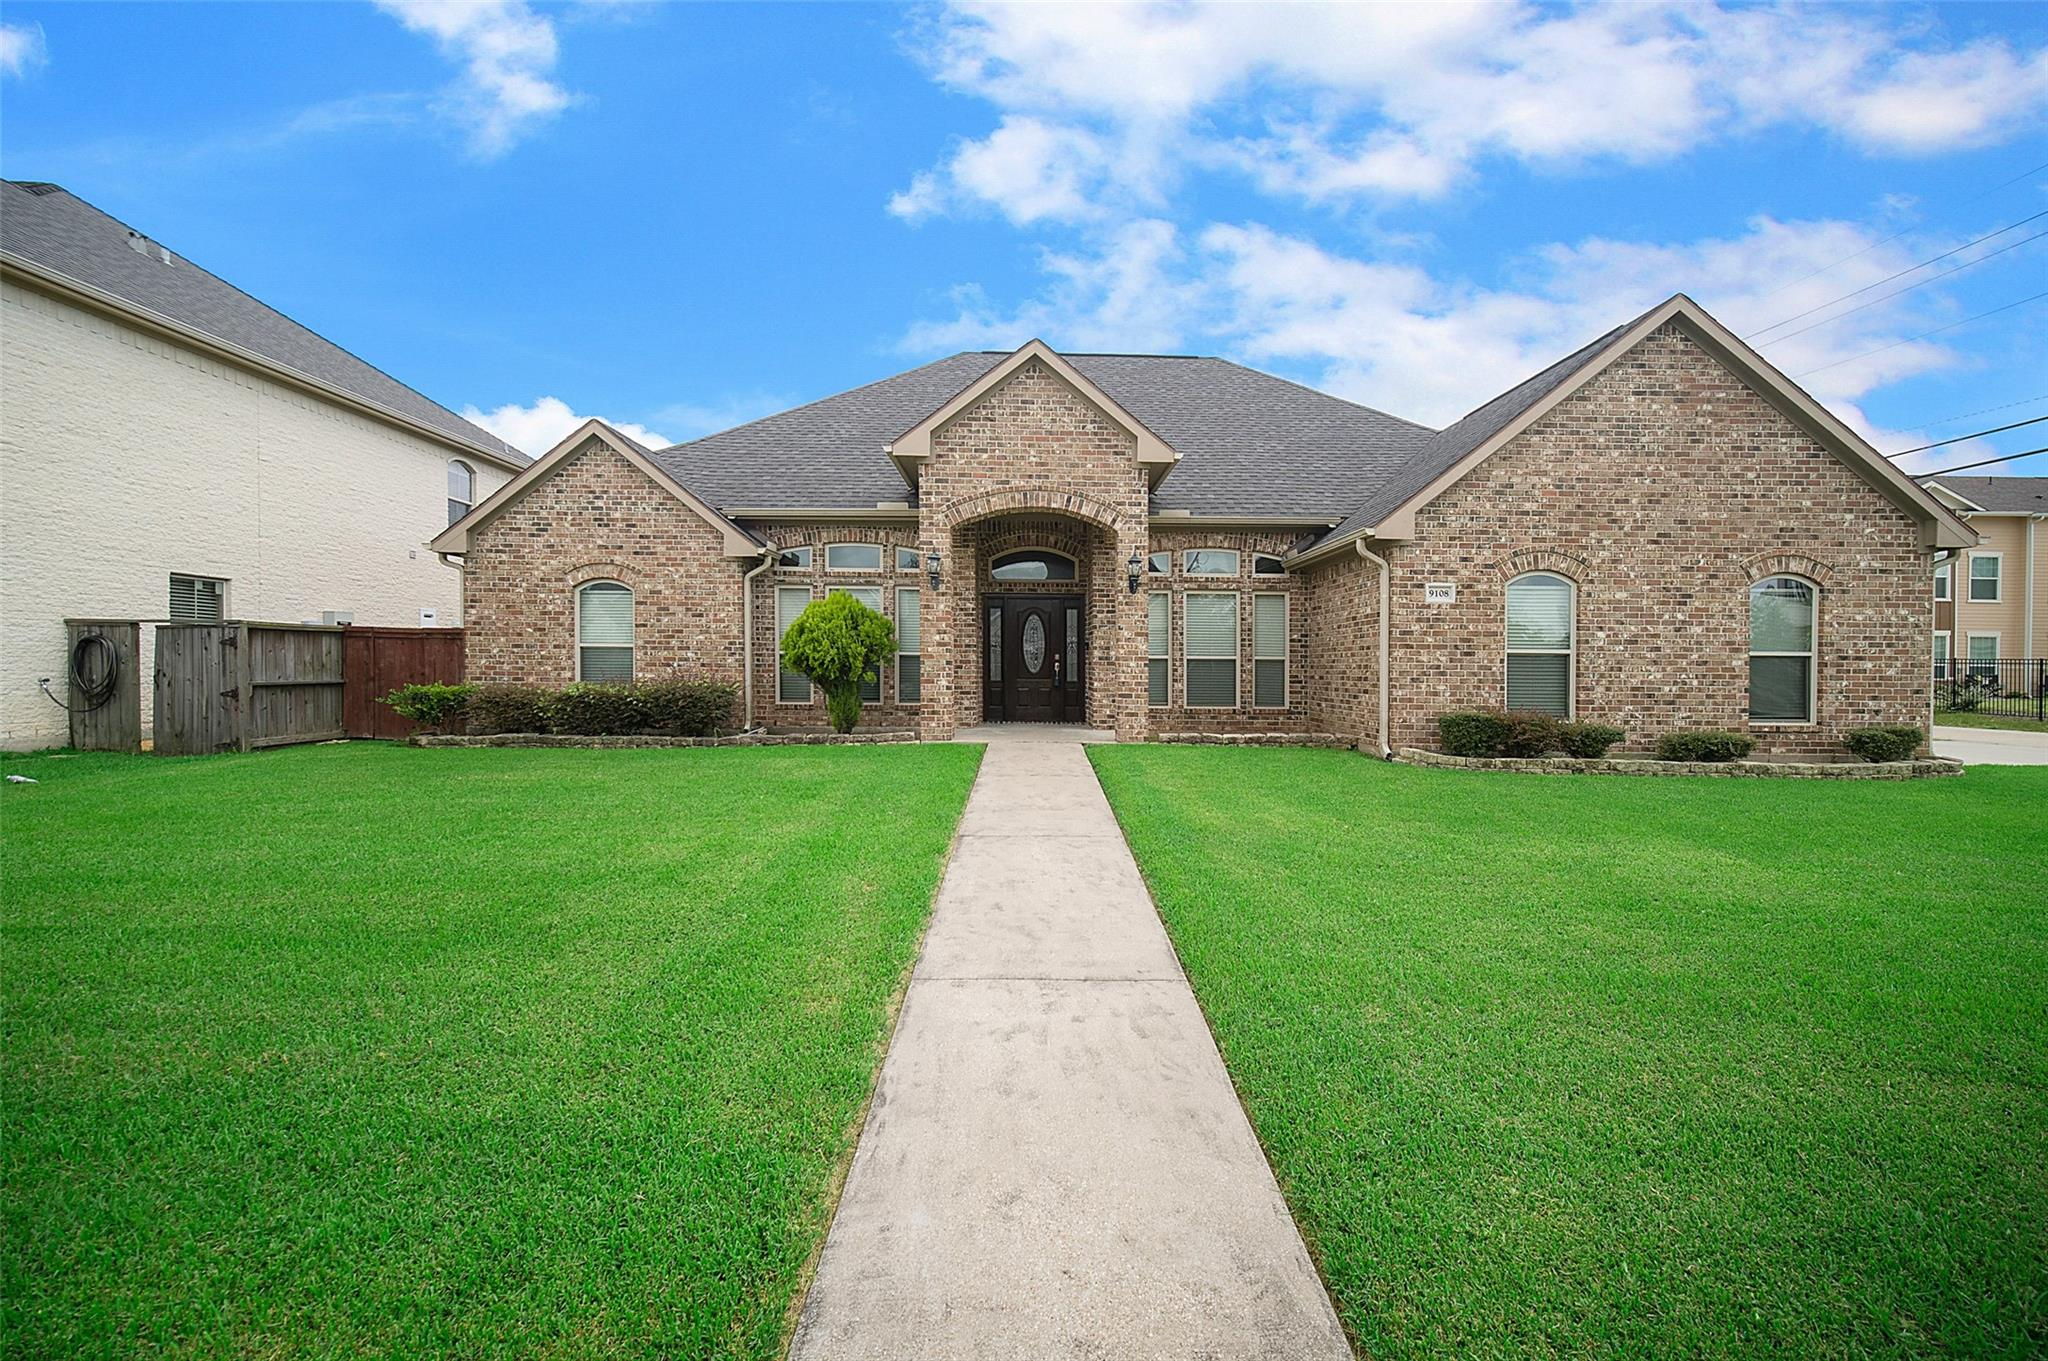 9108 Laura Lane Property Photo - Port Arthur, TX real estate listing